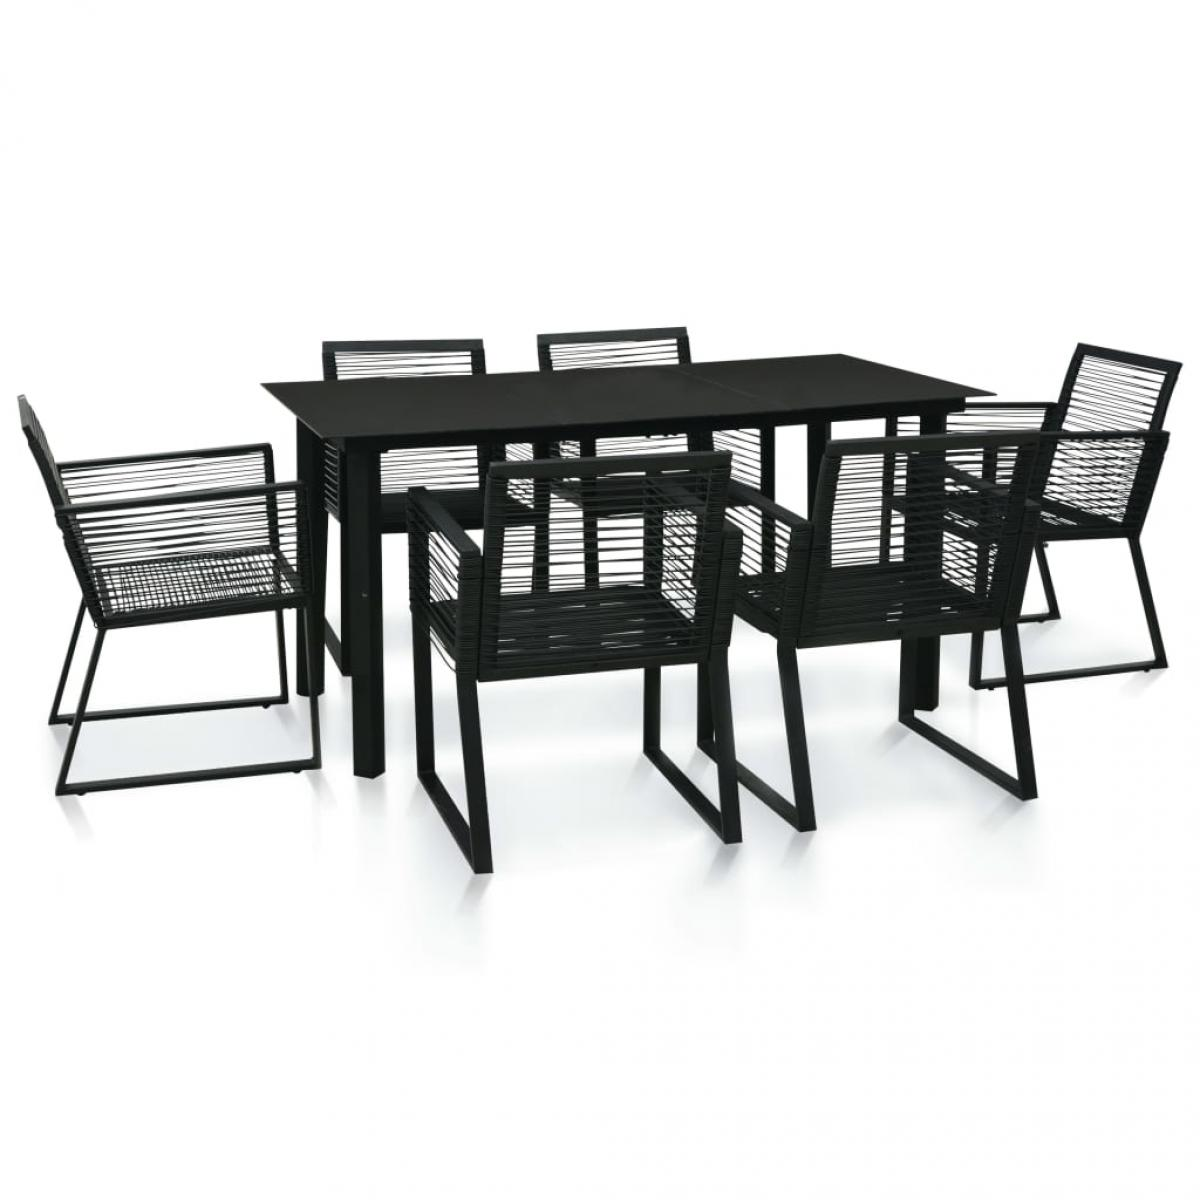 Vidaxl vidaXL Mobilier à dîner d'extérieur 7 pcs Rotin PVC Noir